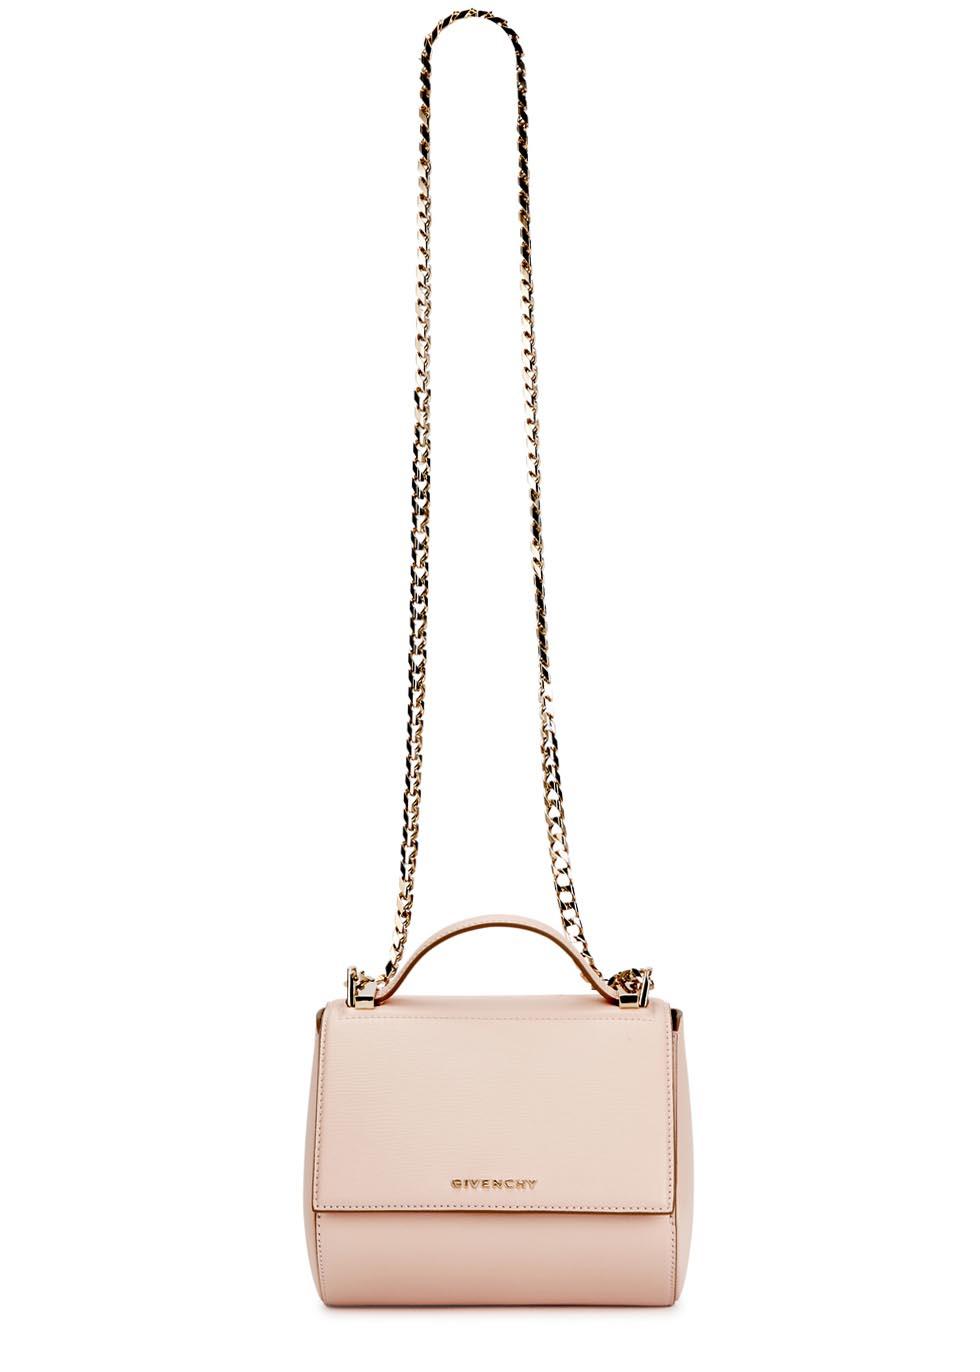 ad031465c8 Givenchy Pandora Mini Blush Leather Box Bag in Natural - Lyst